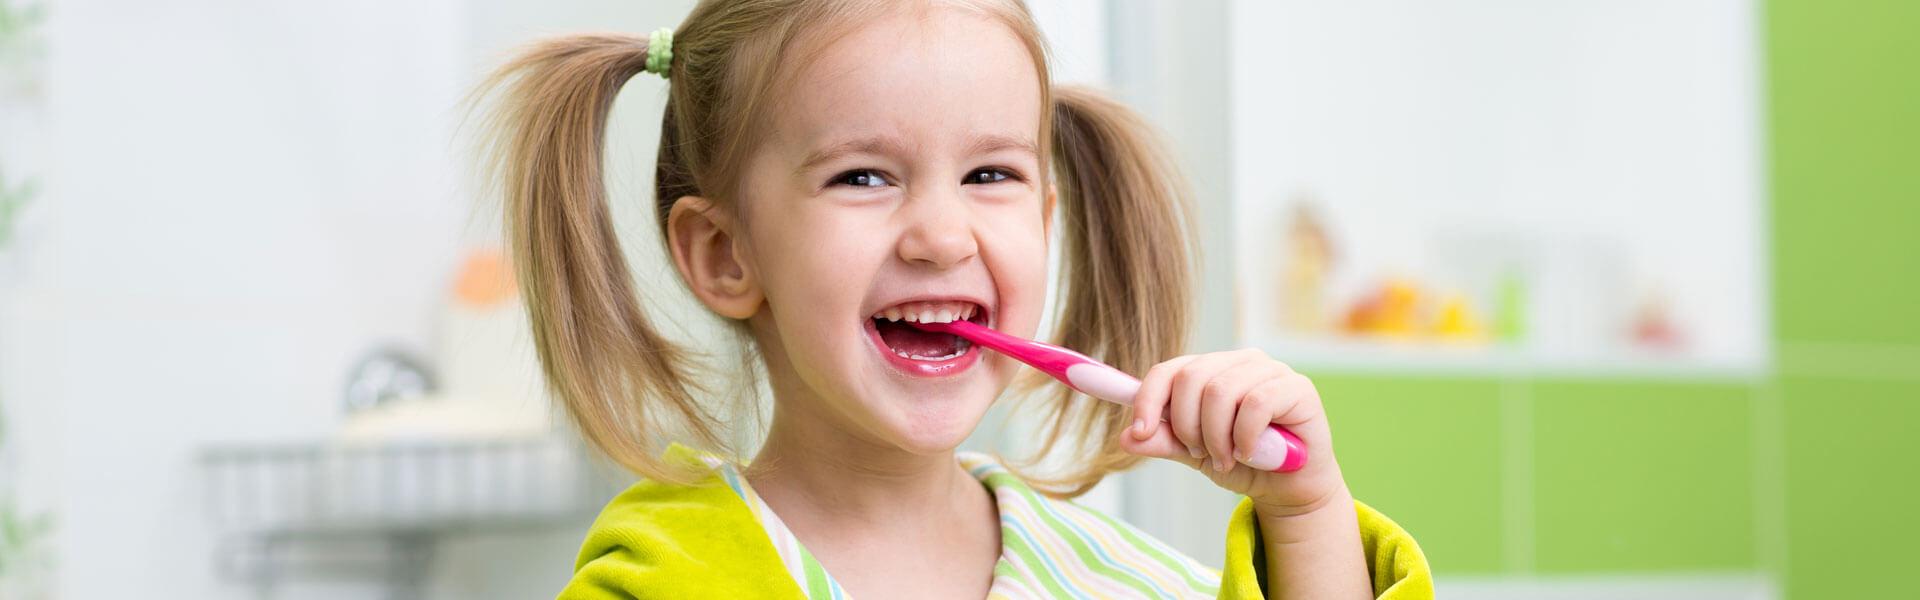 Why Do Kids Need Pediatric Dentistry?